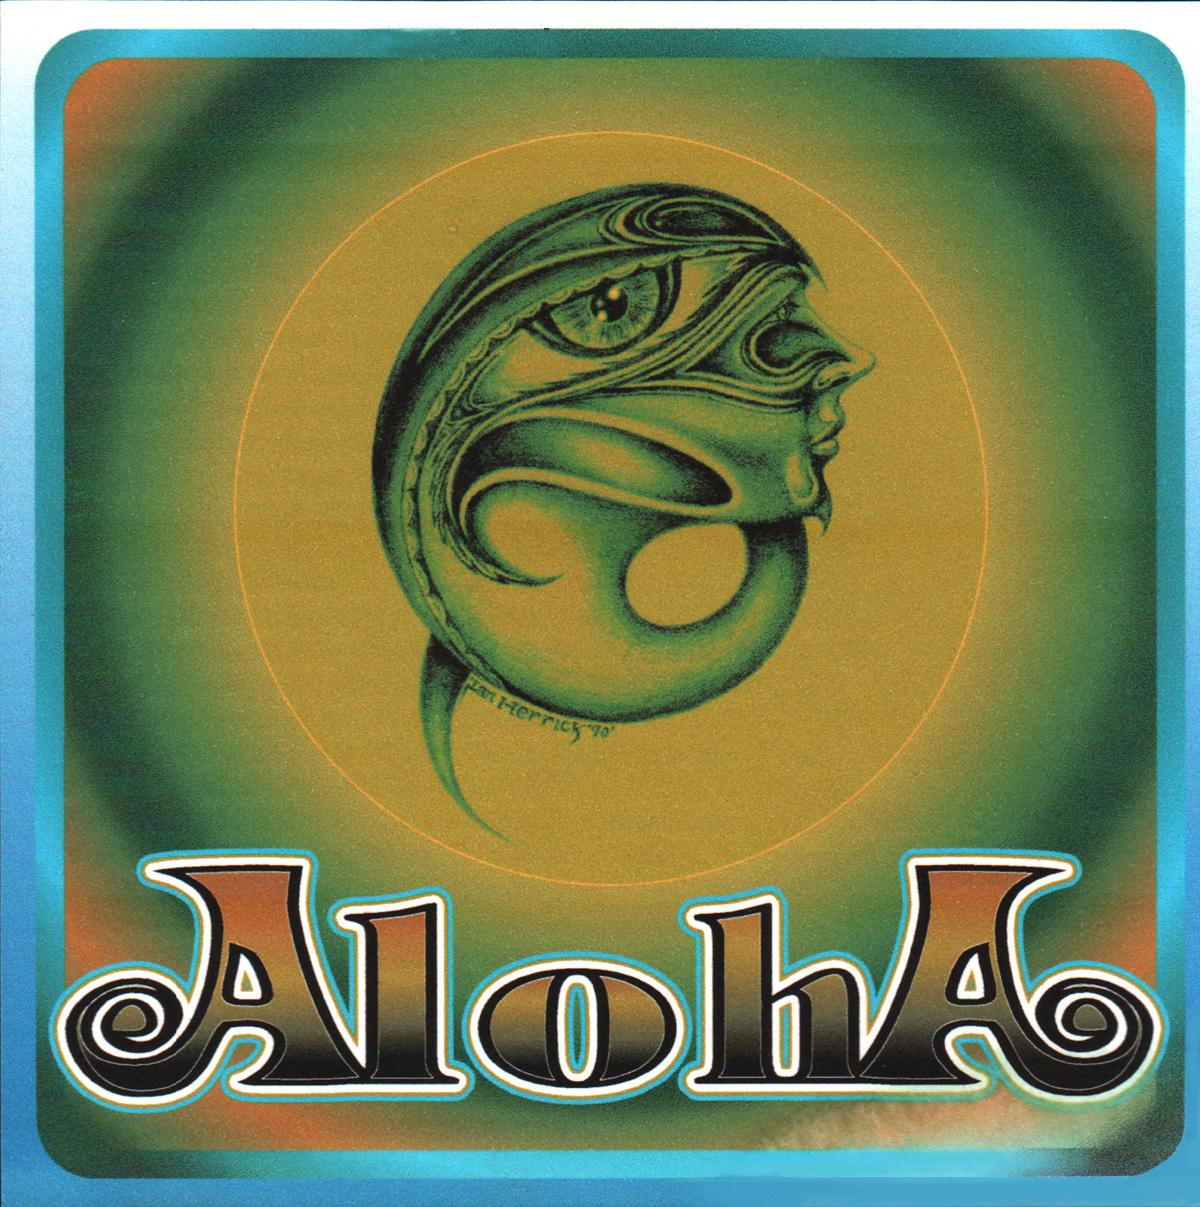 Aloha - 'self titled album'